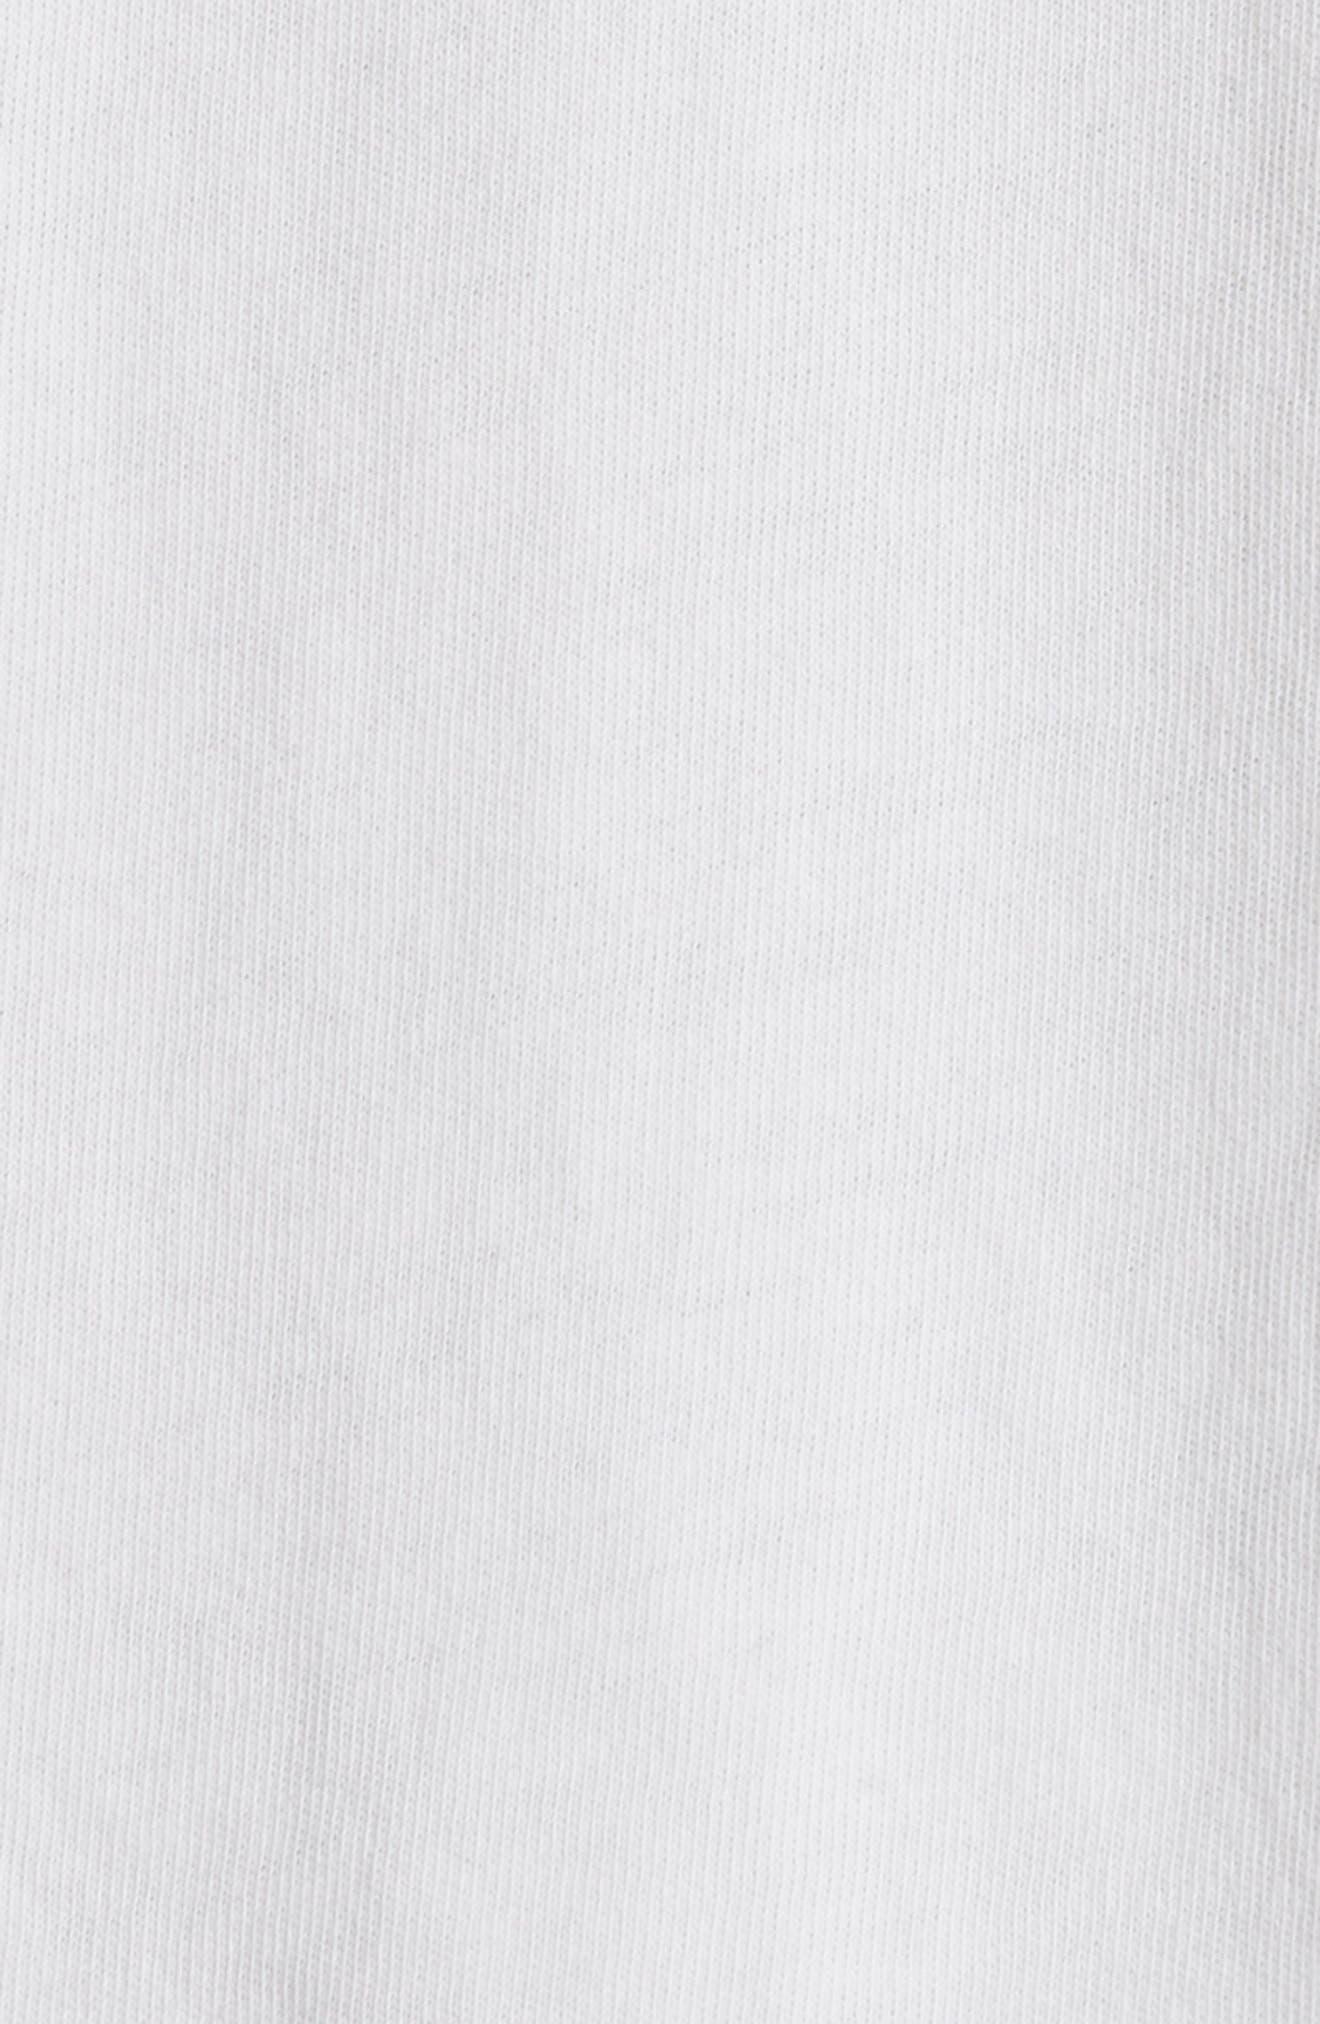 Sex Pistols Graphic T-Shirt,                             Alternate thumbnail 5, color,                             Off White